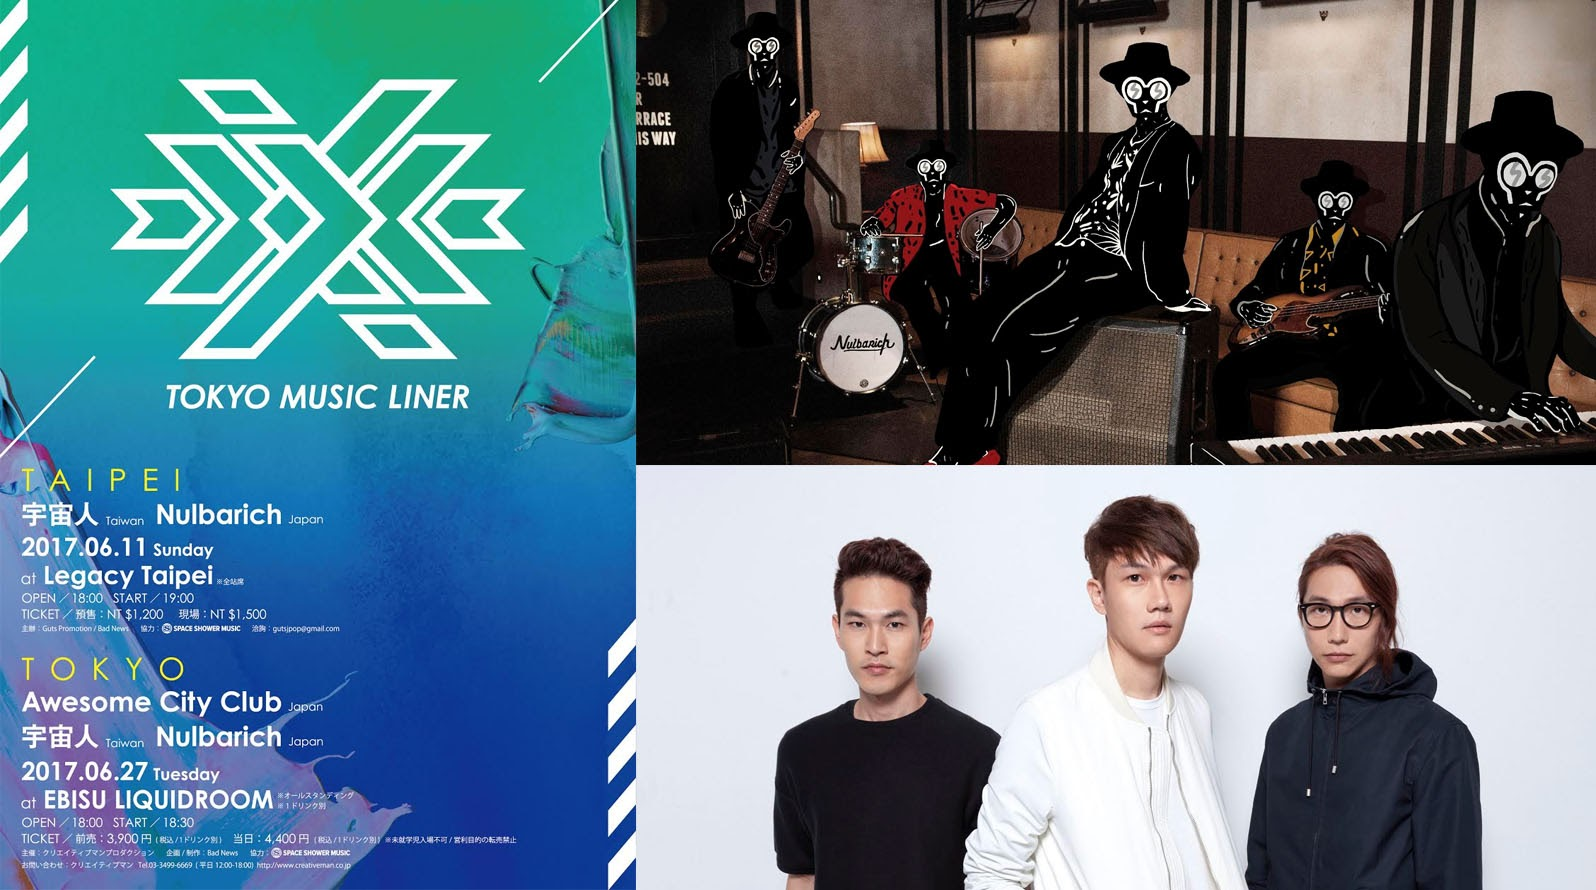 LIVE定期航班「TOKYO MUSIC LINER」宣告正式啟航! Nulbarich和宇宙人6月11日台北Legacy攜手共演